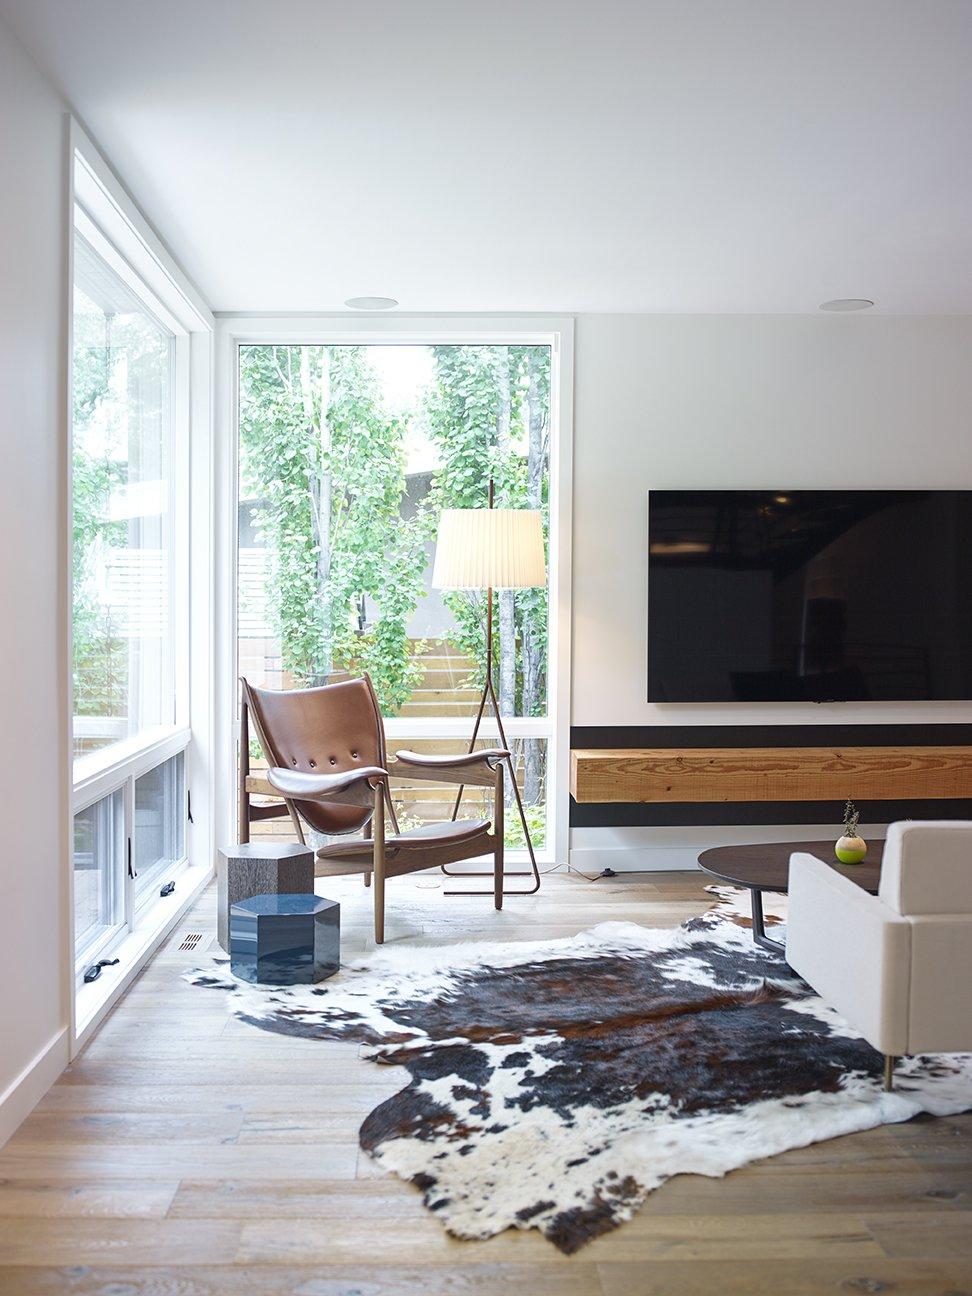 Living Room, Chair, Recessed Lighting, Medium Hardwood Floor, Sofa, Floor Lighting, and End Tables Living Room   Crestwood Re-Model by Mindy Gudzinski Design